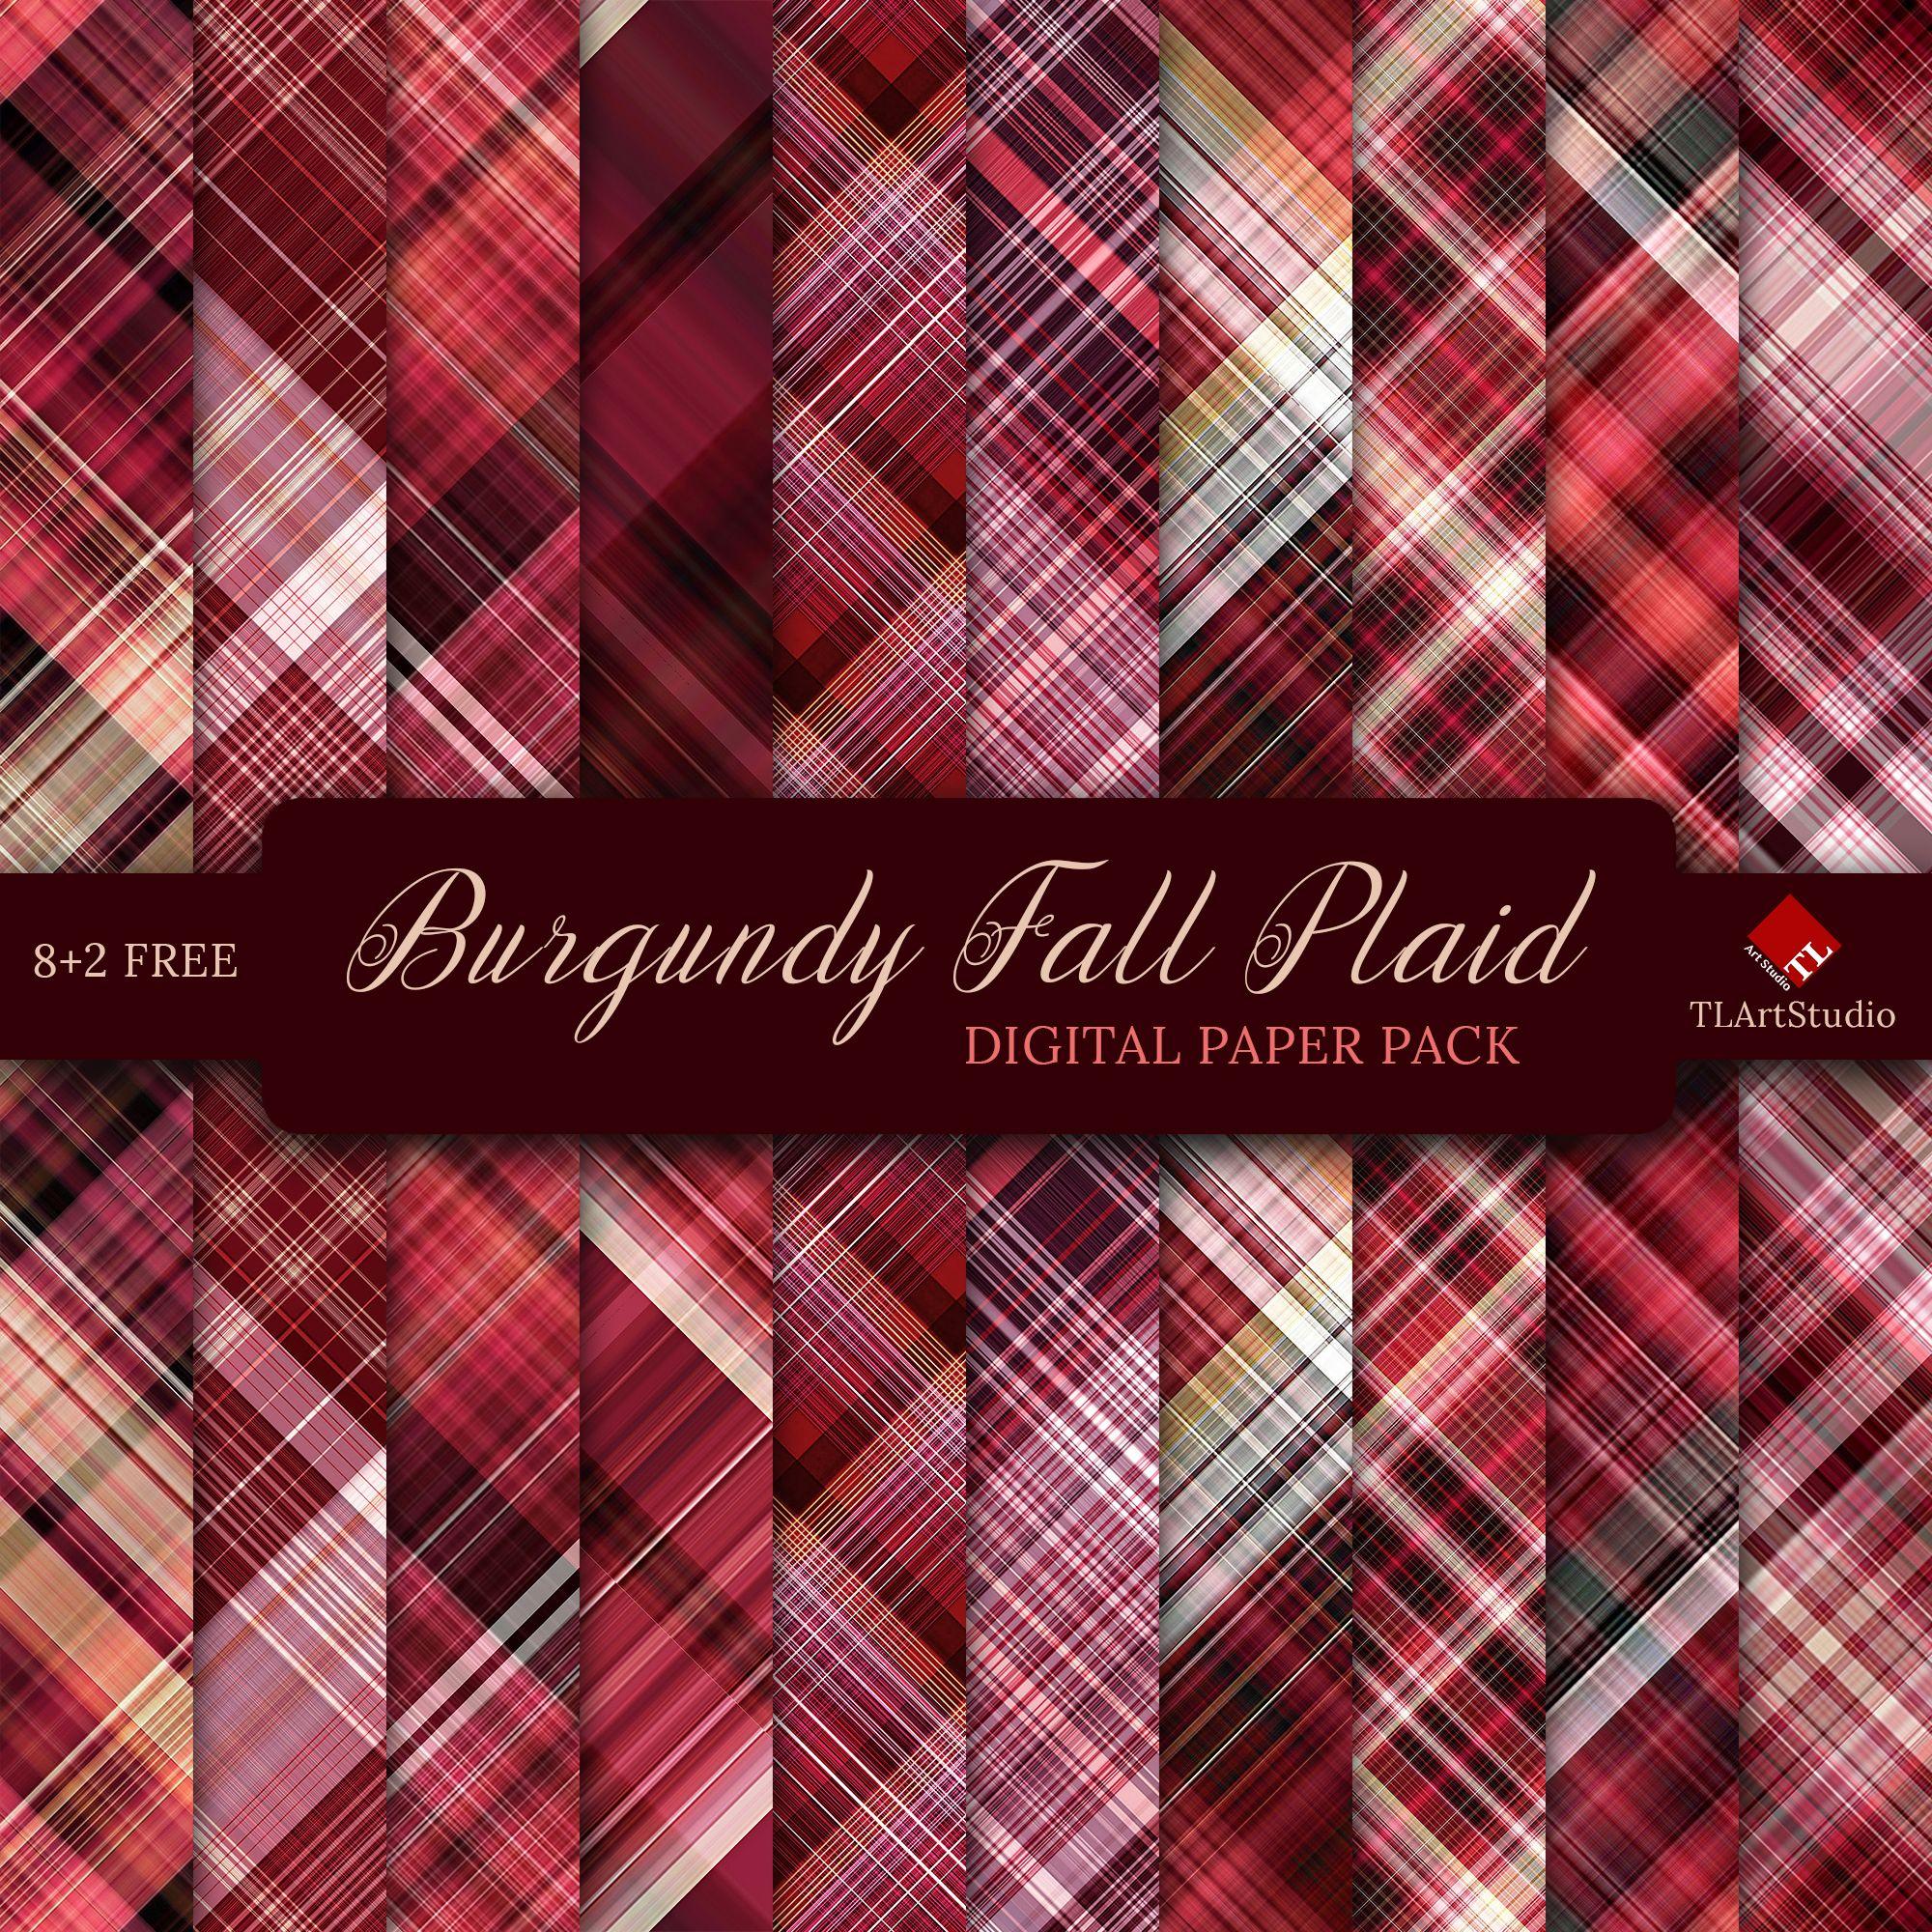 Burgundy Plaid Autumn Digital Paper Pack 1 Commercial Use Etsy In 2020 Digital Paper Digital Scrapbook Paper Scrapbook Background